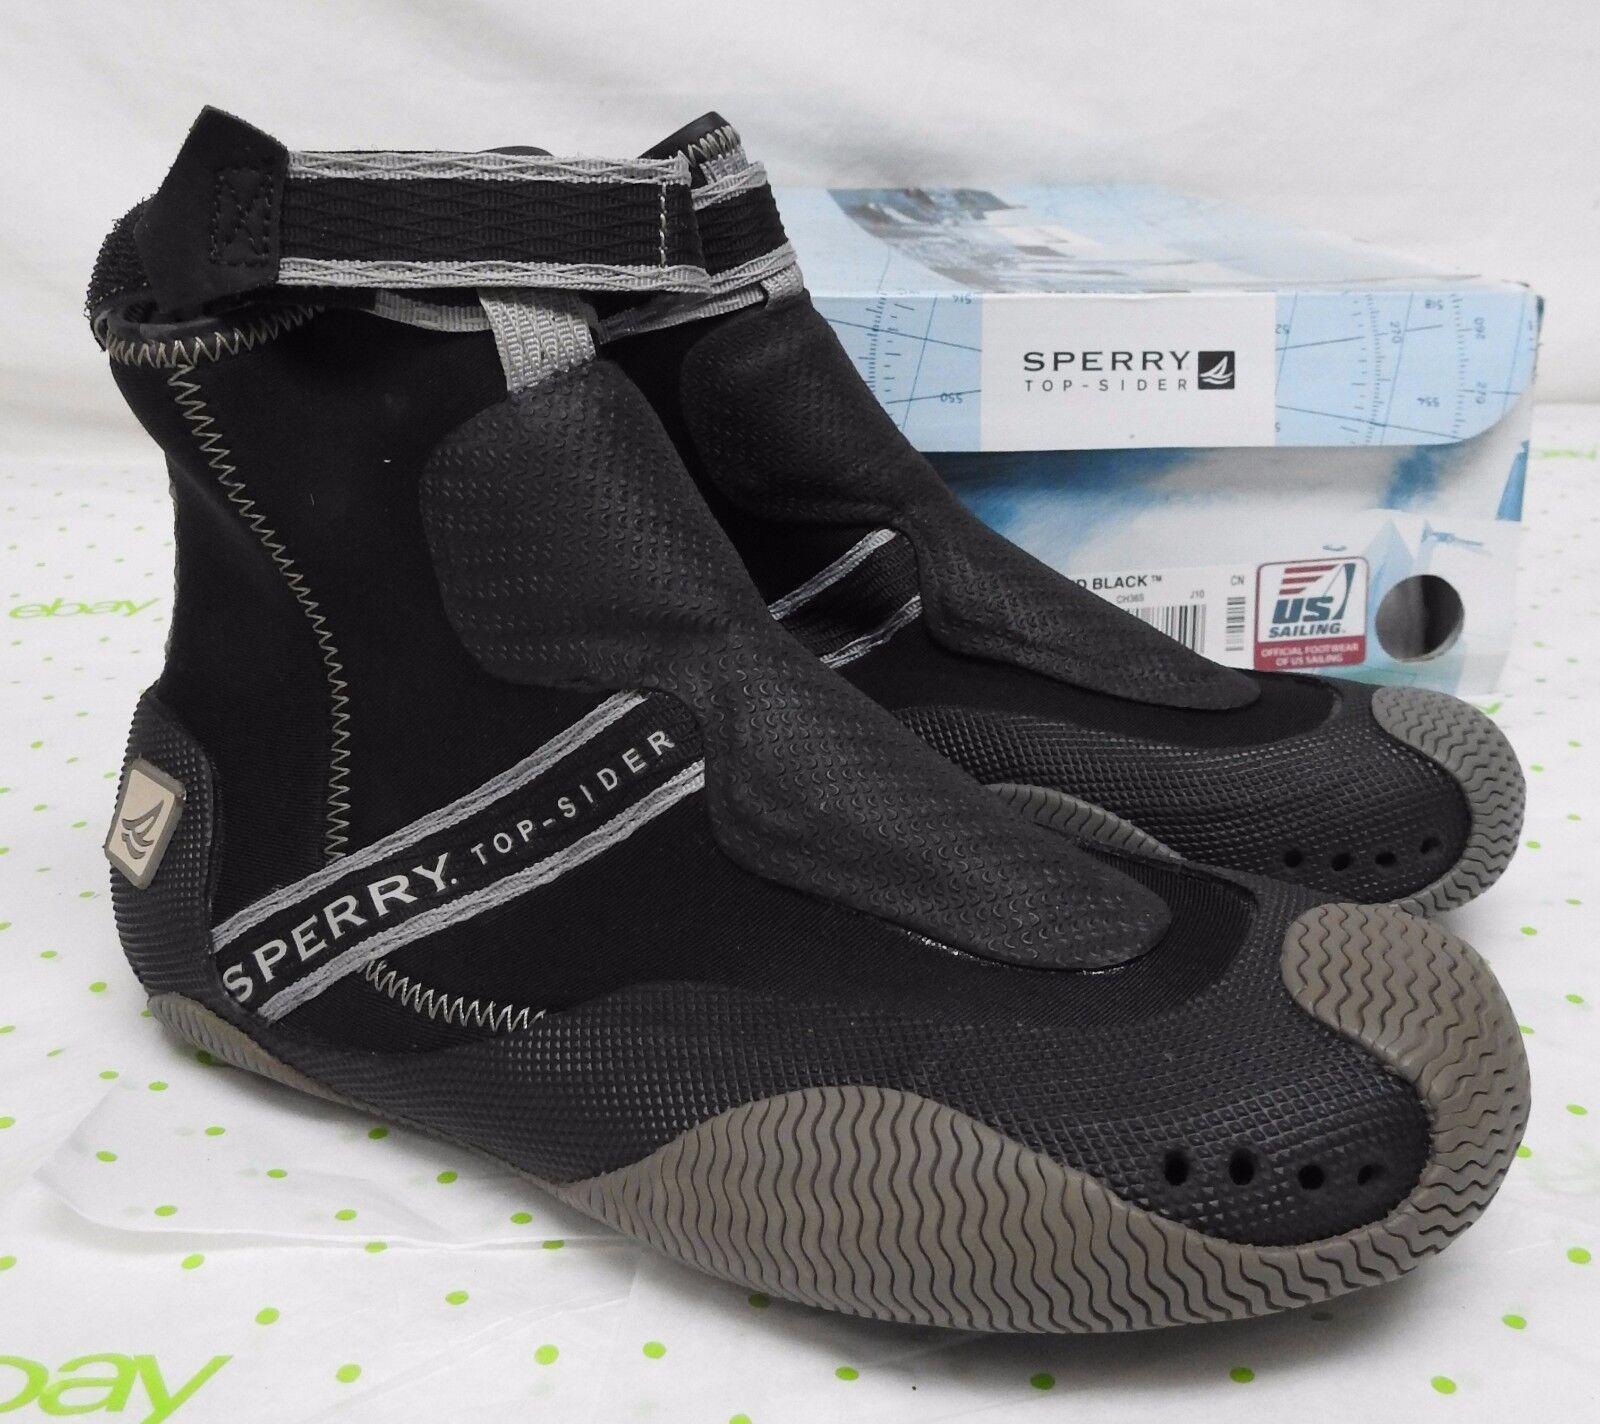 Sperry Top Sider men's size 4.5 M Ebb Tide boot black